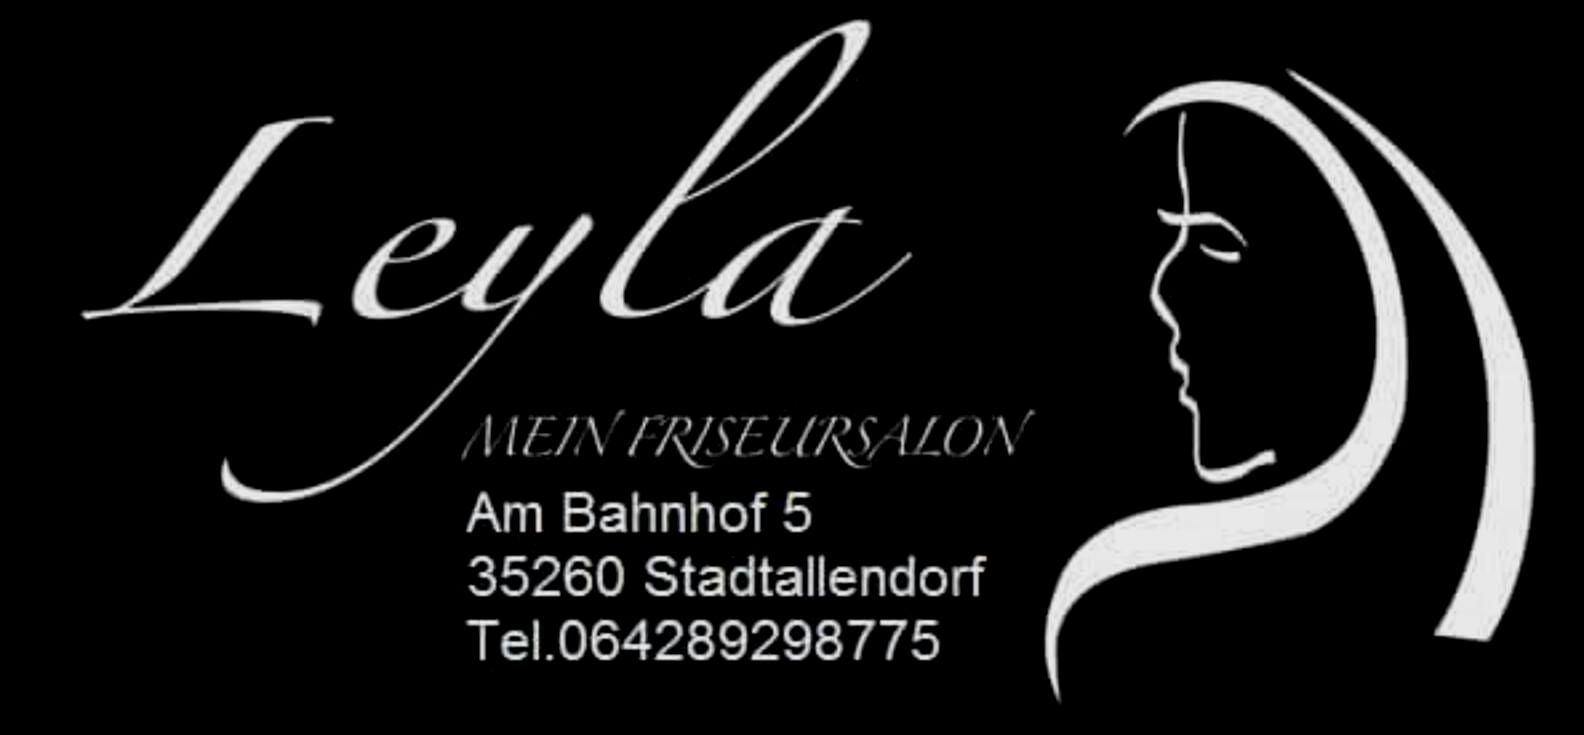 Leyla mein Friseursalon